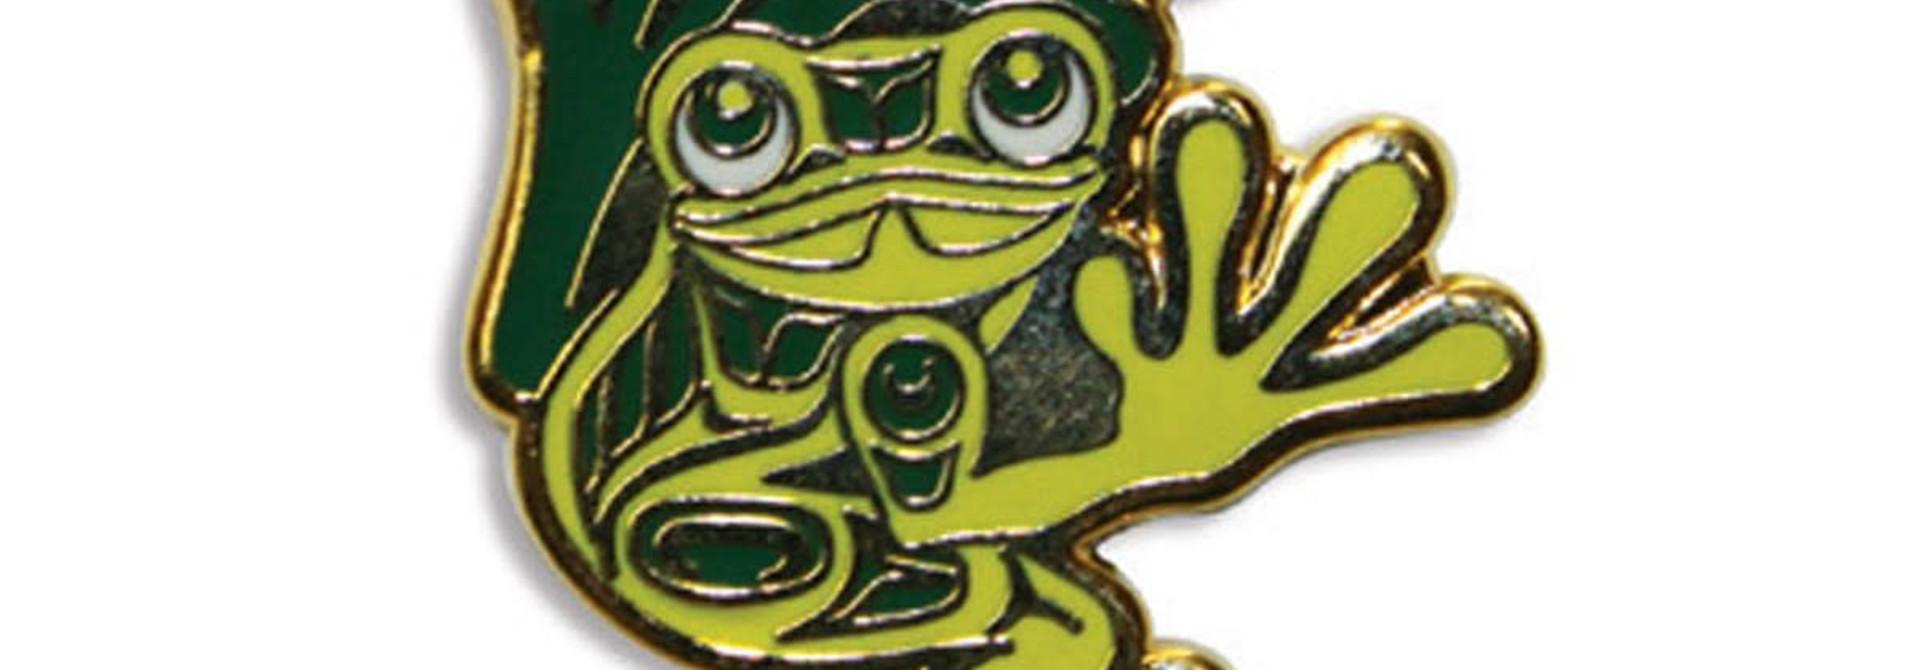 Enamel Pin Frog- Corey W. Moraes